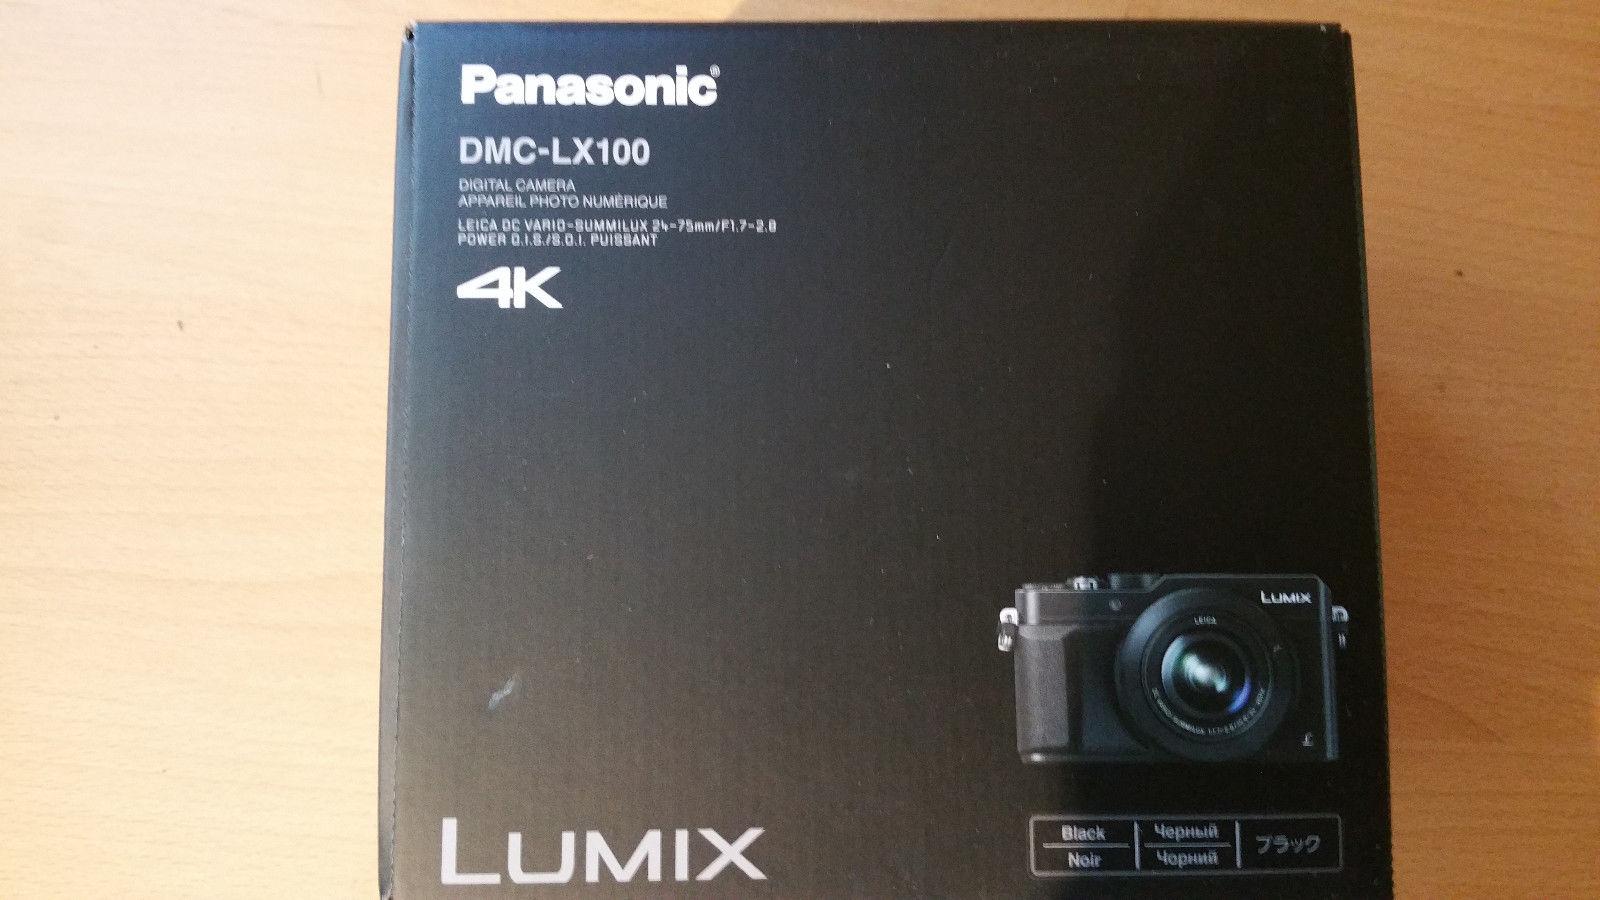 Panasonic LUMIX DMC-LX 100 16.8 MP Digitalkamera - Schwarz